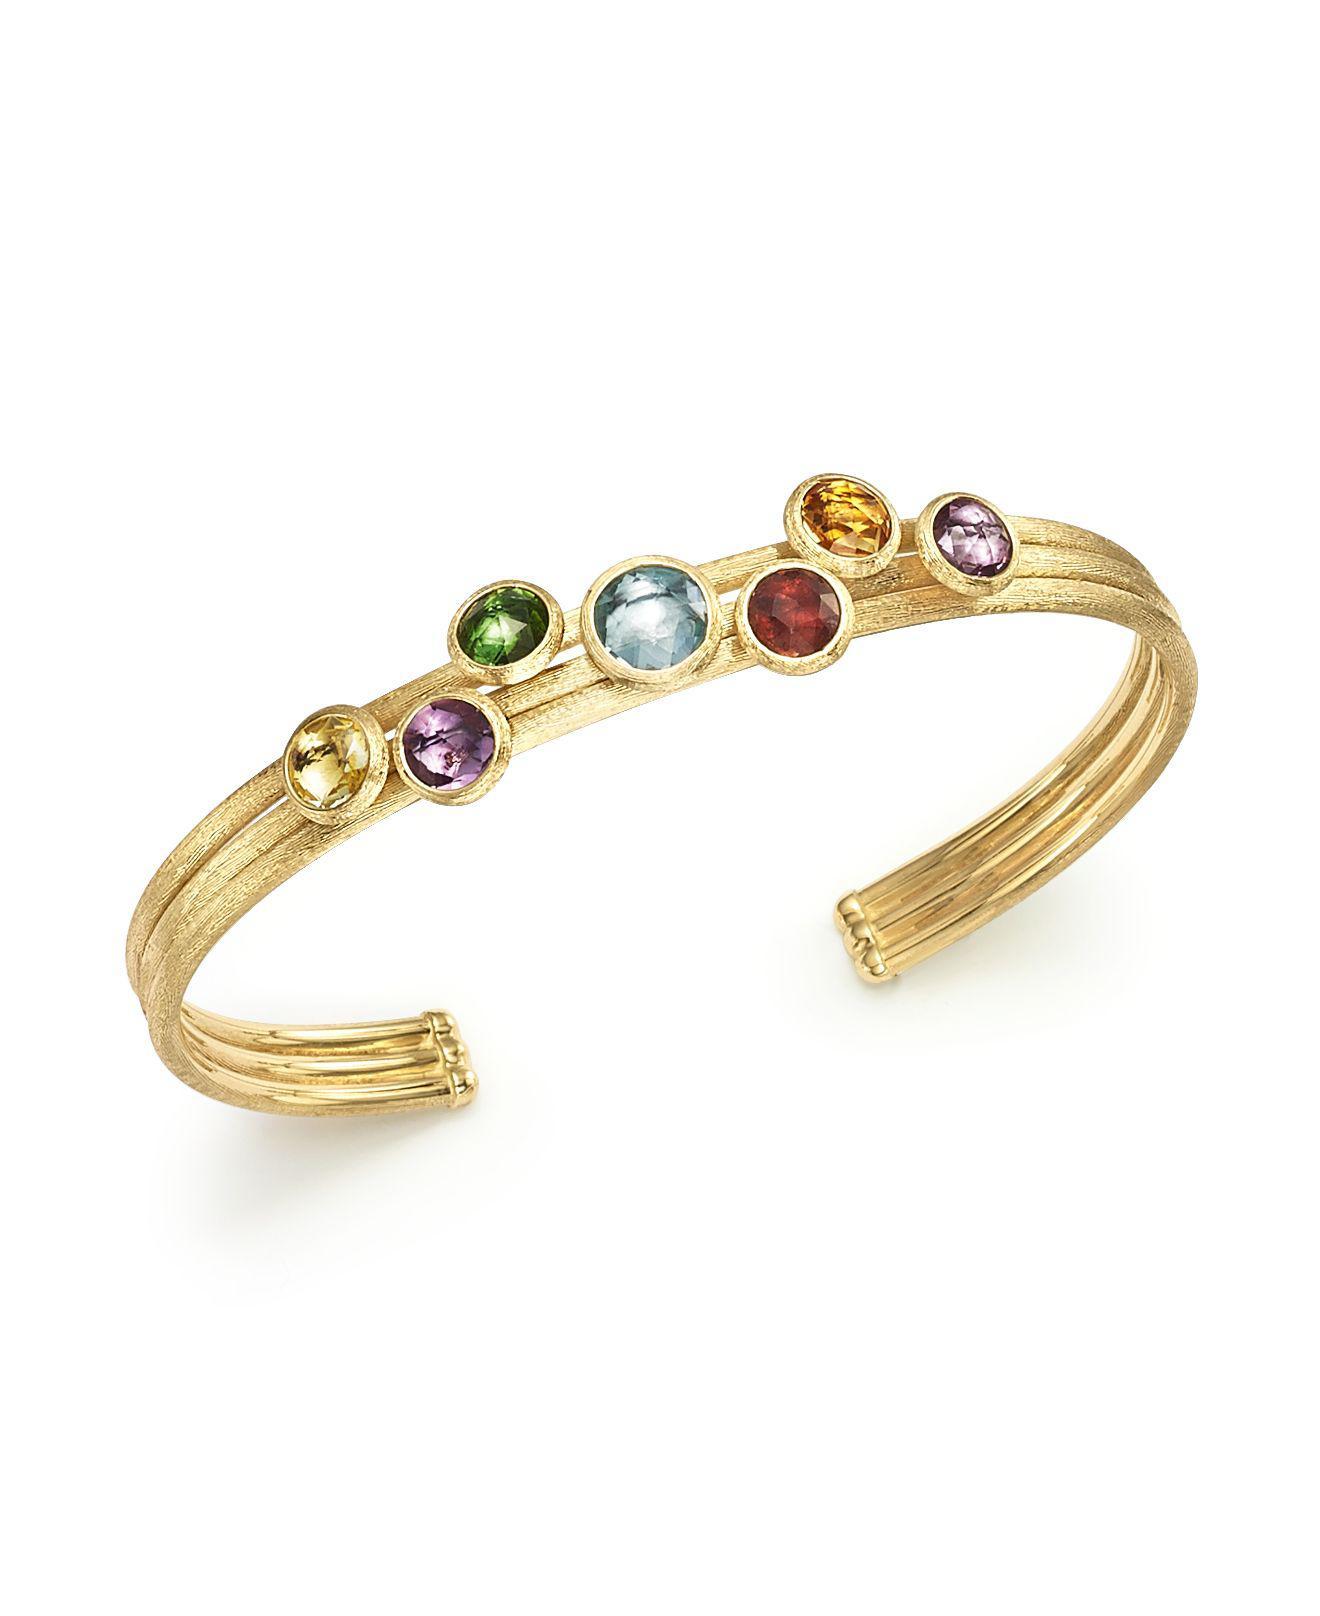 Marco Bicego Jaipur 18K Multi-Stone Cuff Bracelet qFm5c